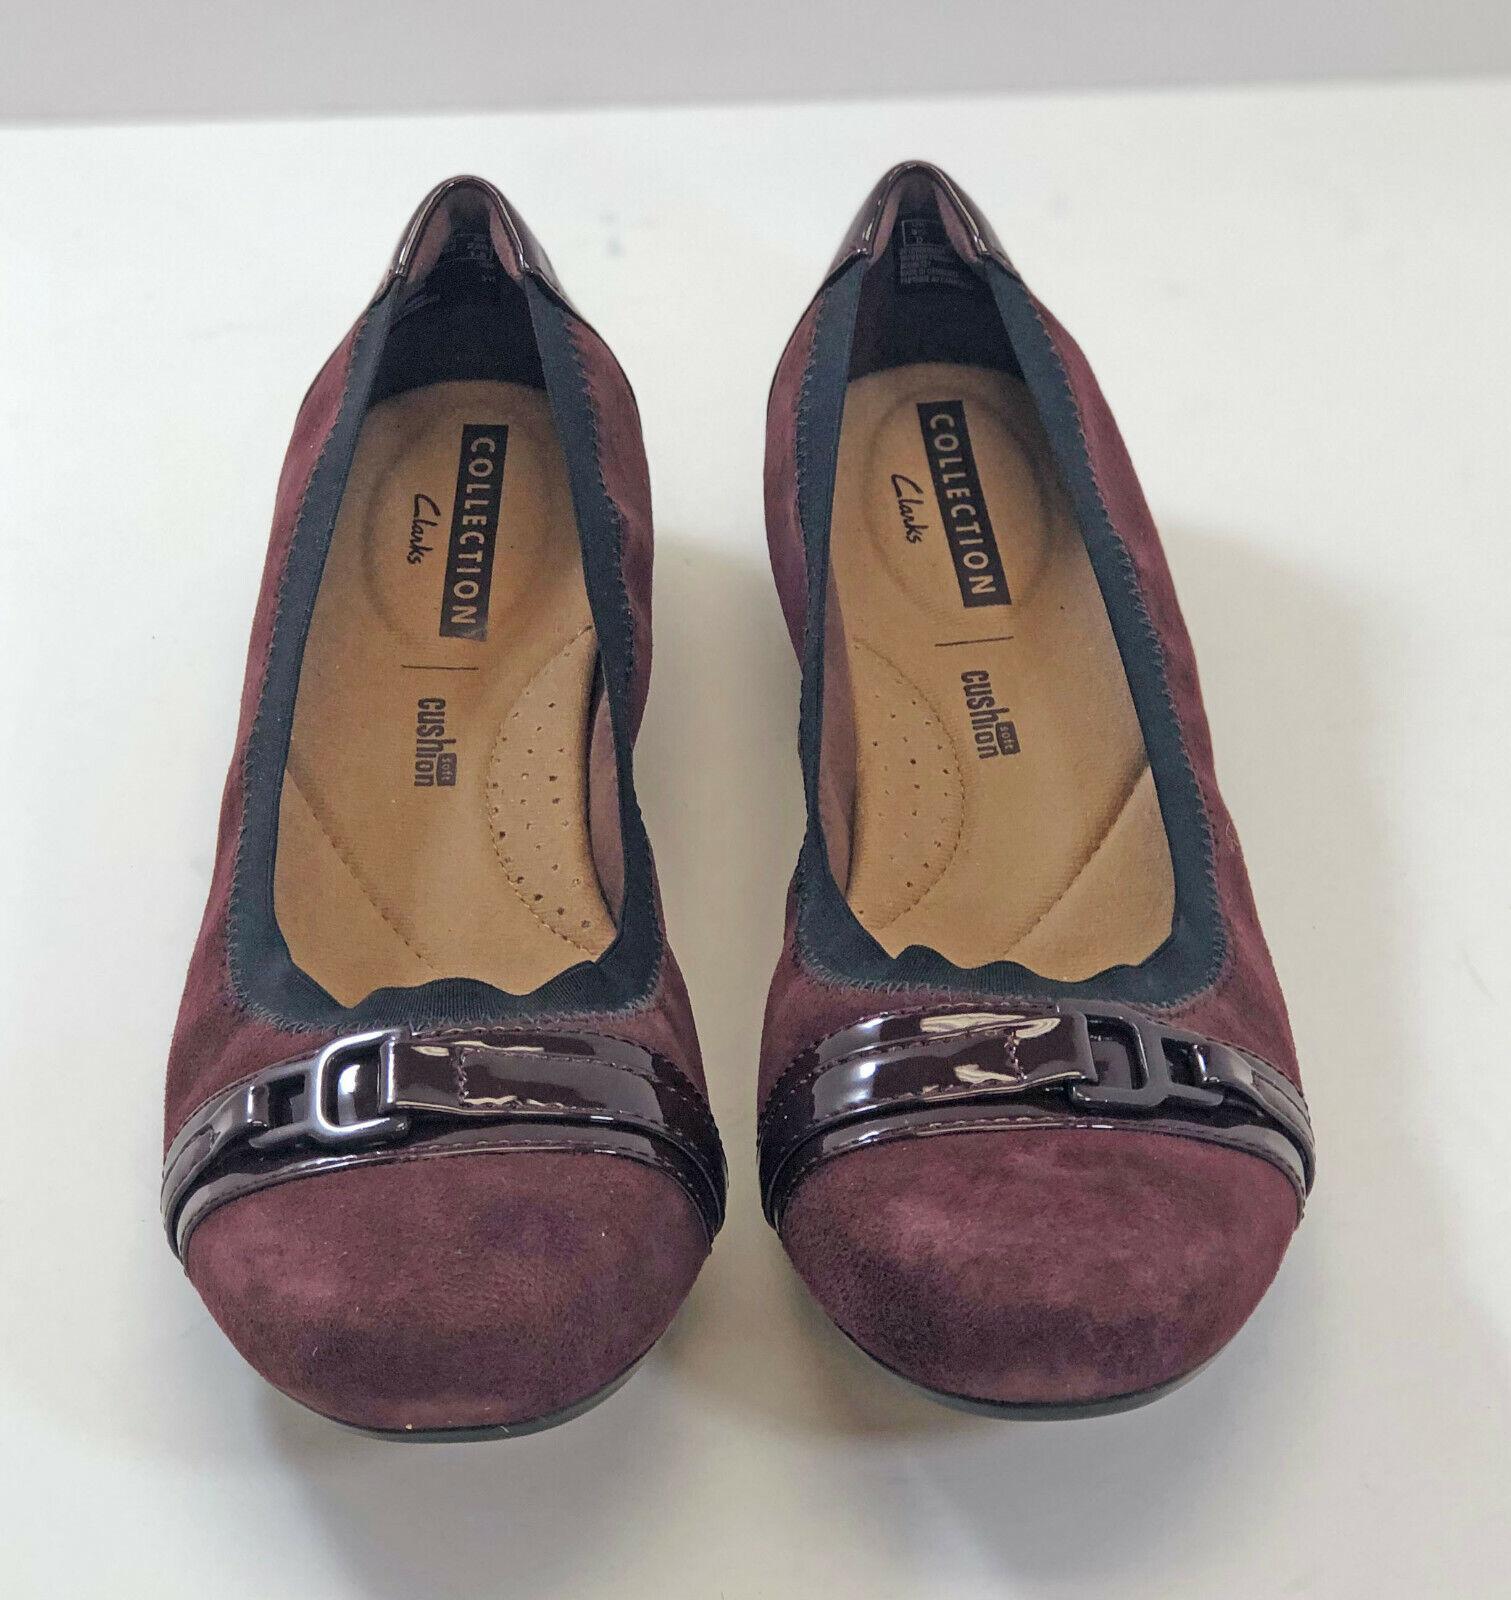 Clarks Leather Slip-on Flats - Kinzie Light Women's 6 Medium Burgundy